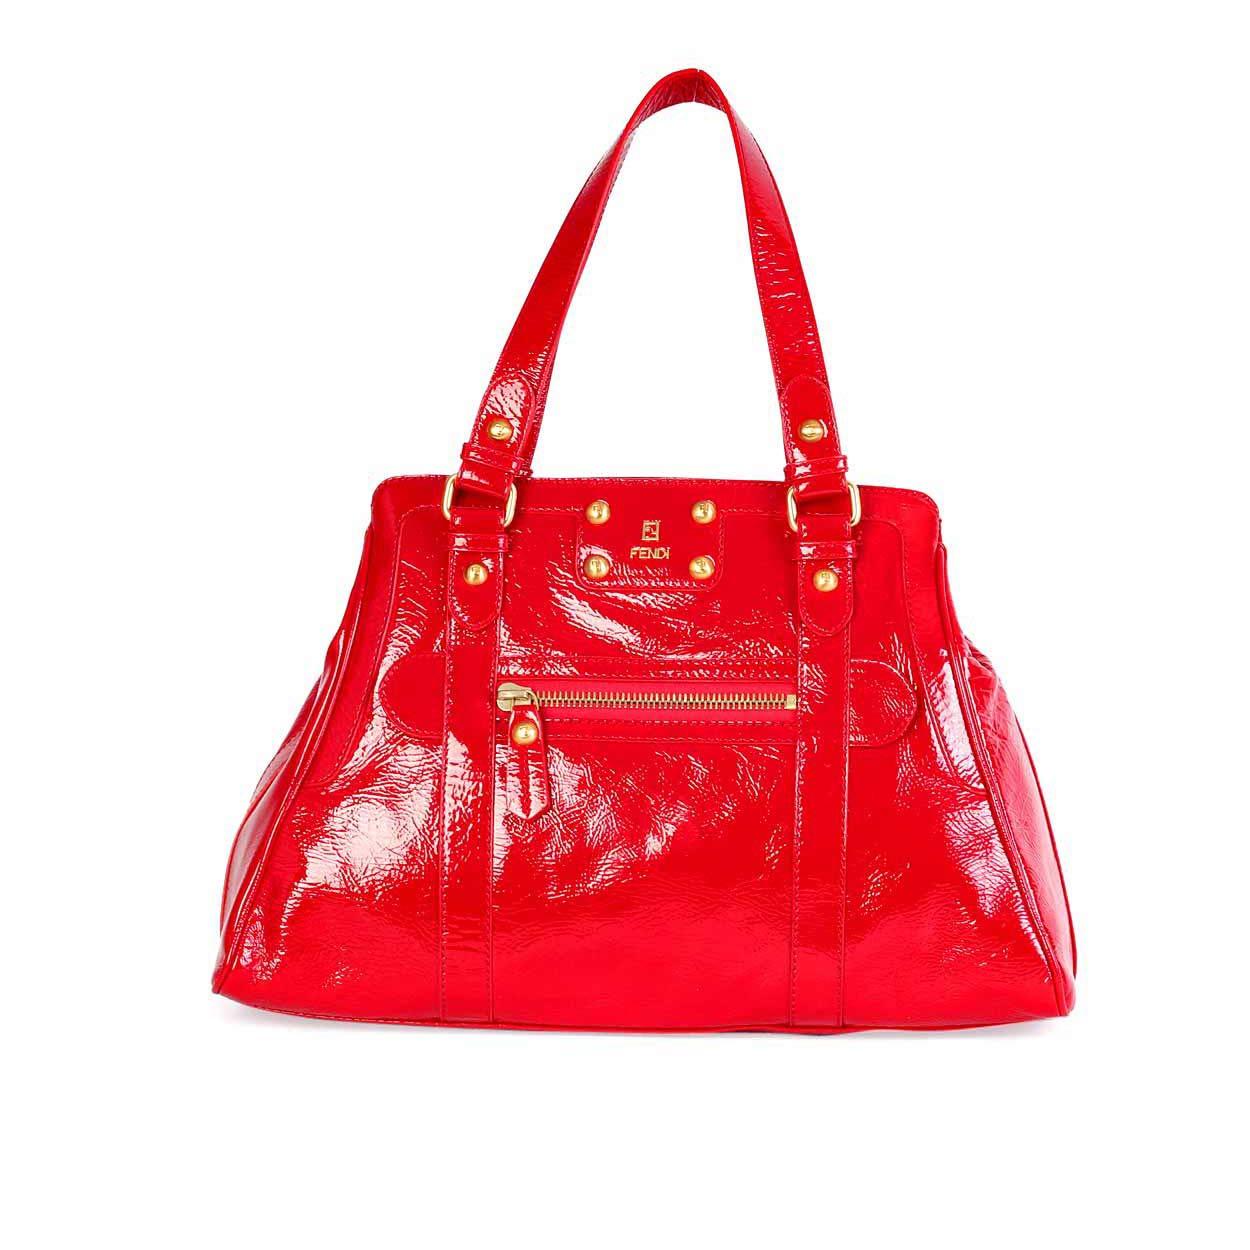 c66968d1f19c ... get fendi patent bag du jour red new luxity 0f128 b9f35 ...